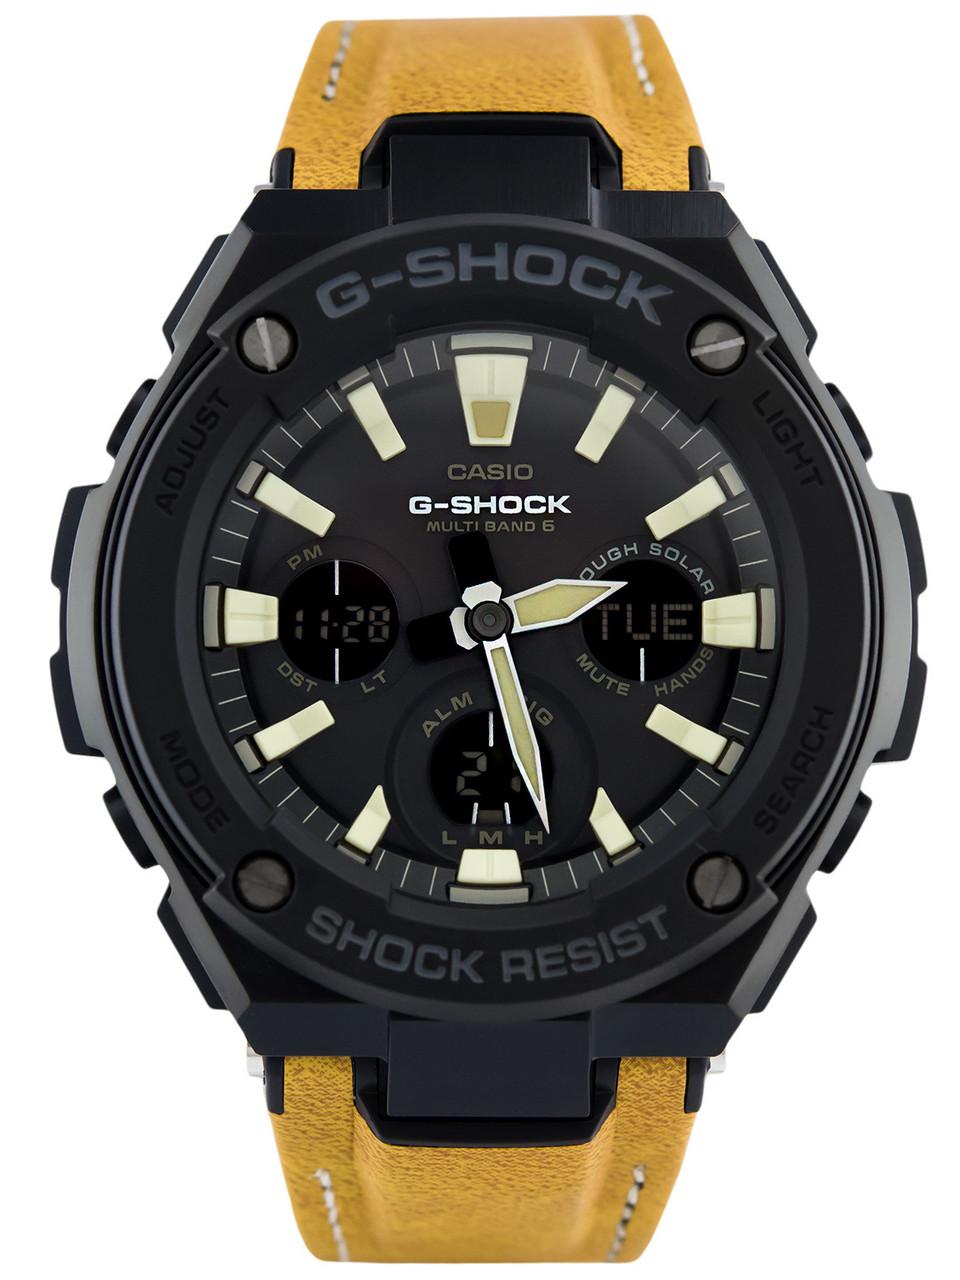 Часы Casio G-Shock G-Steel GST-S120L-1B TOUGH SOLAR